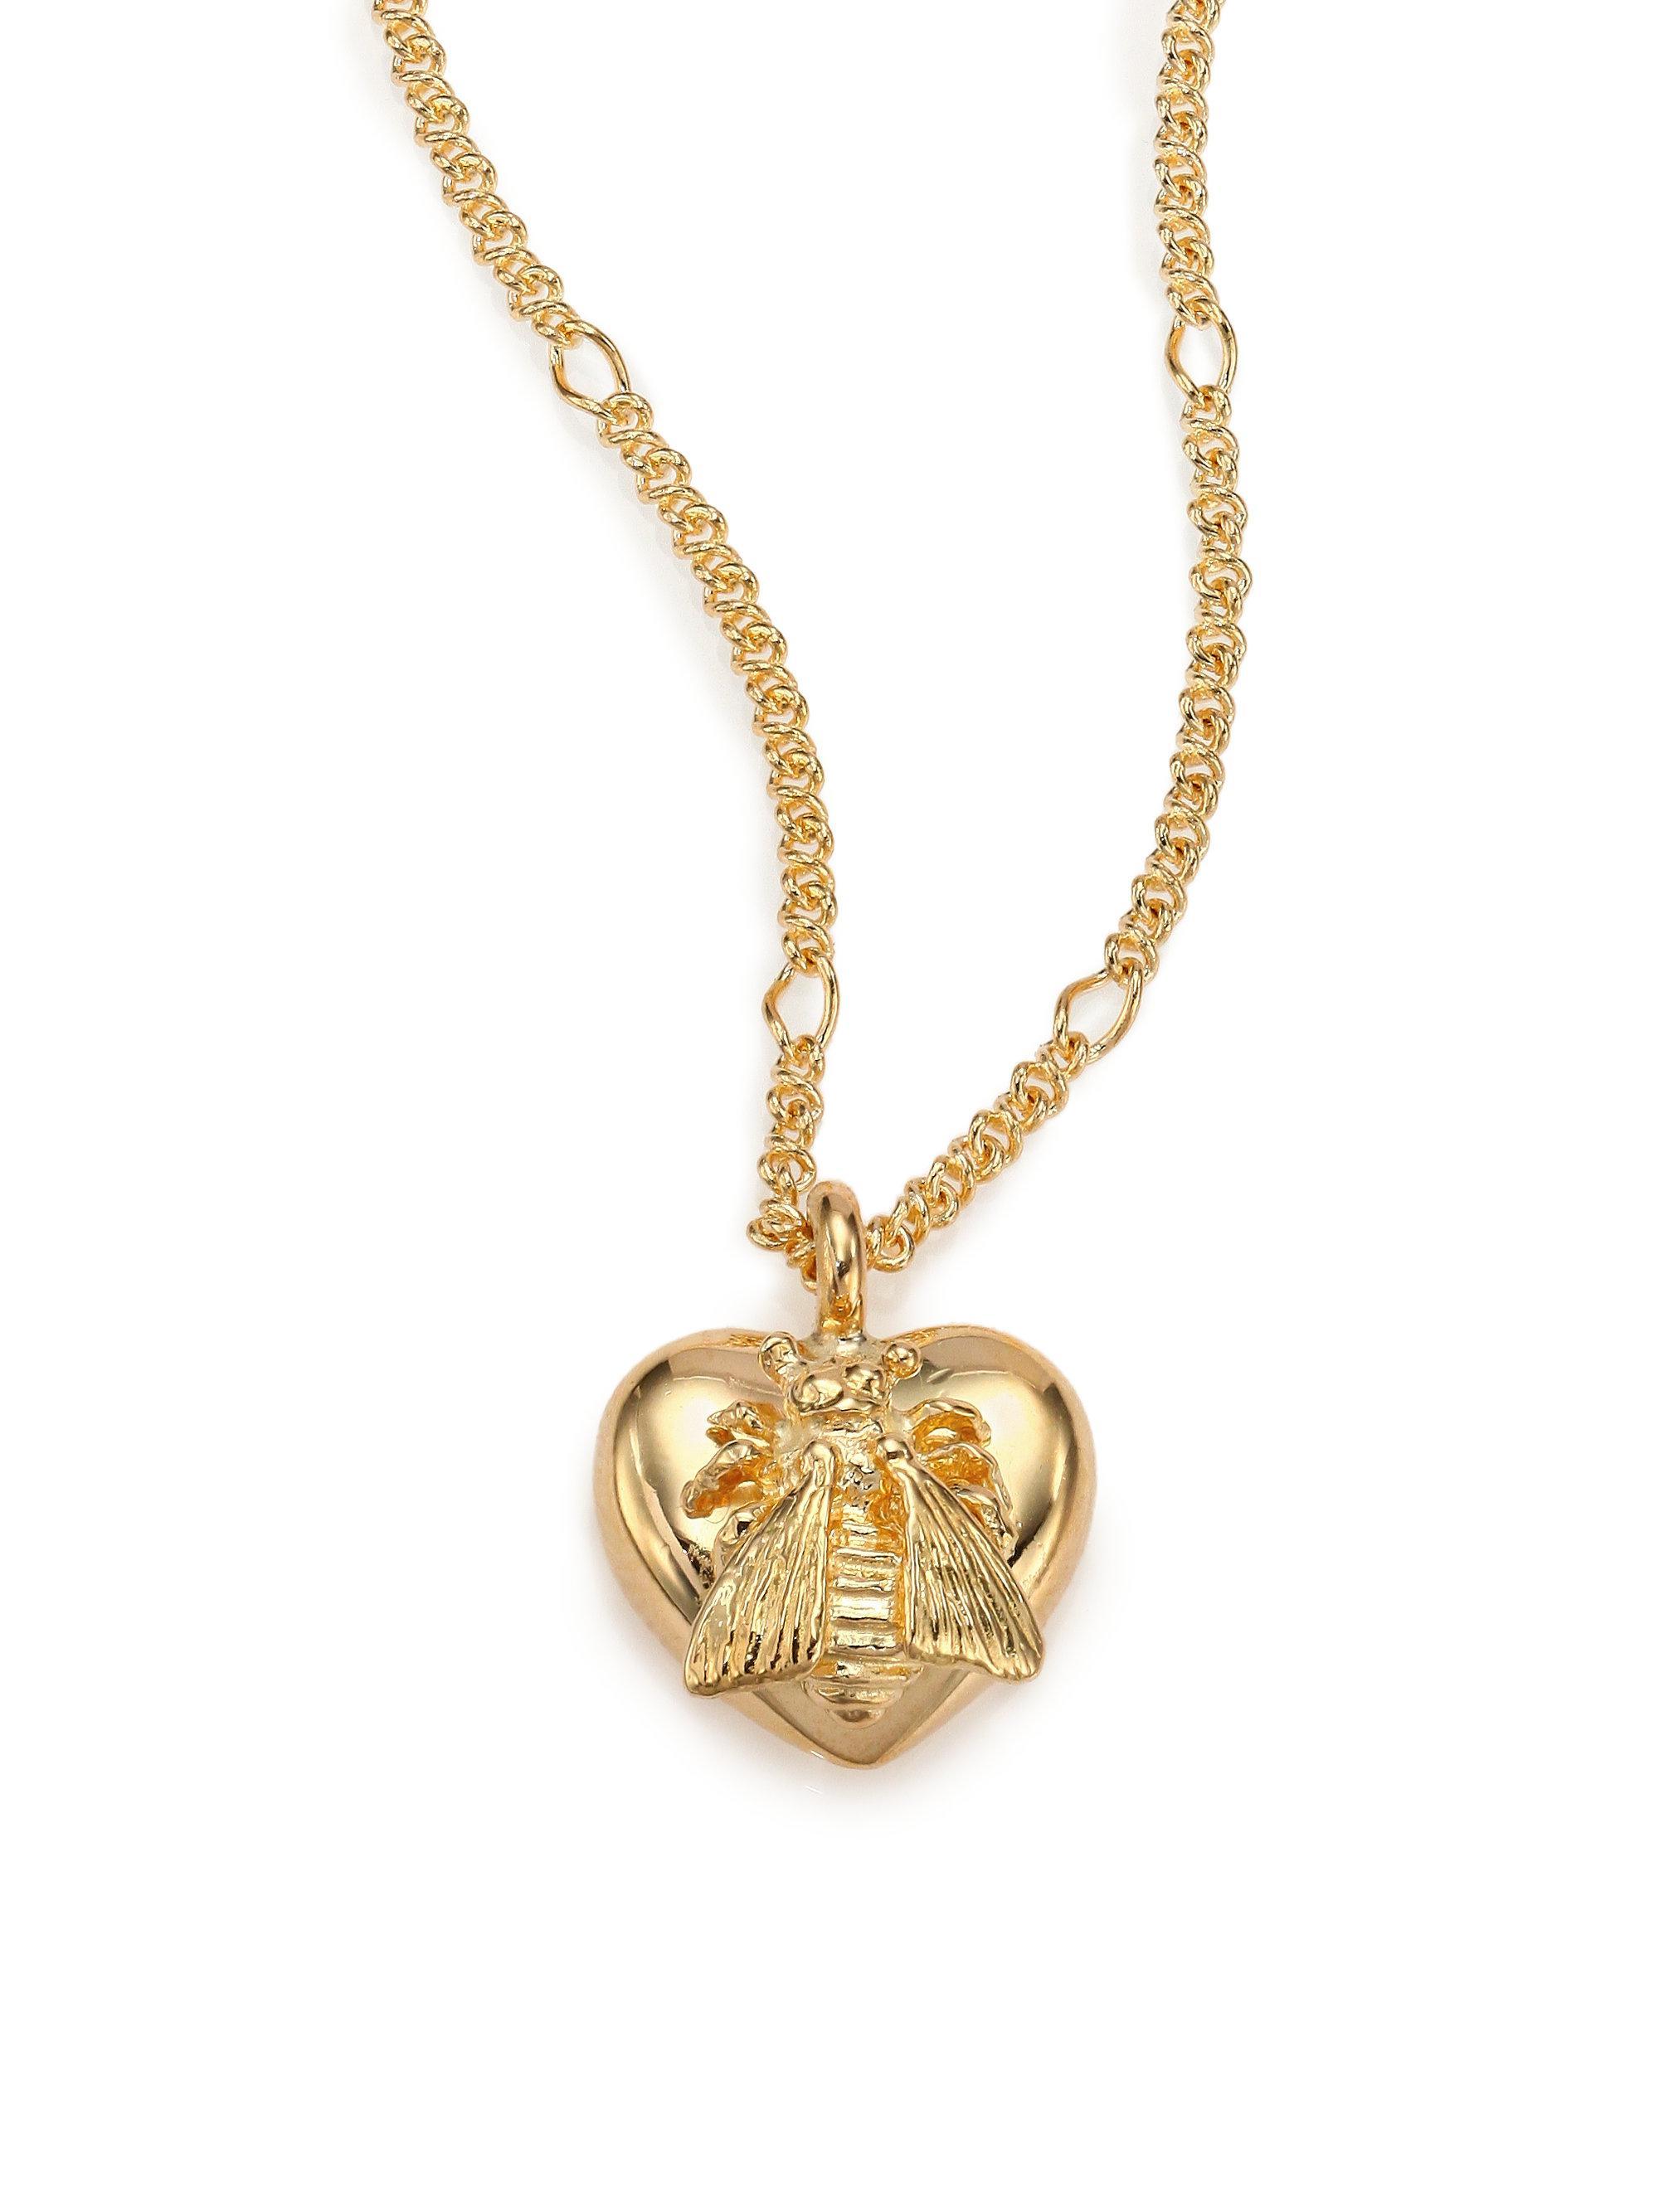 97d95c95609de Gucci Metallic 18k Yellow Gold Bee Heart Pendant Necklace